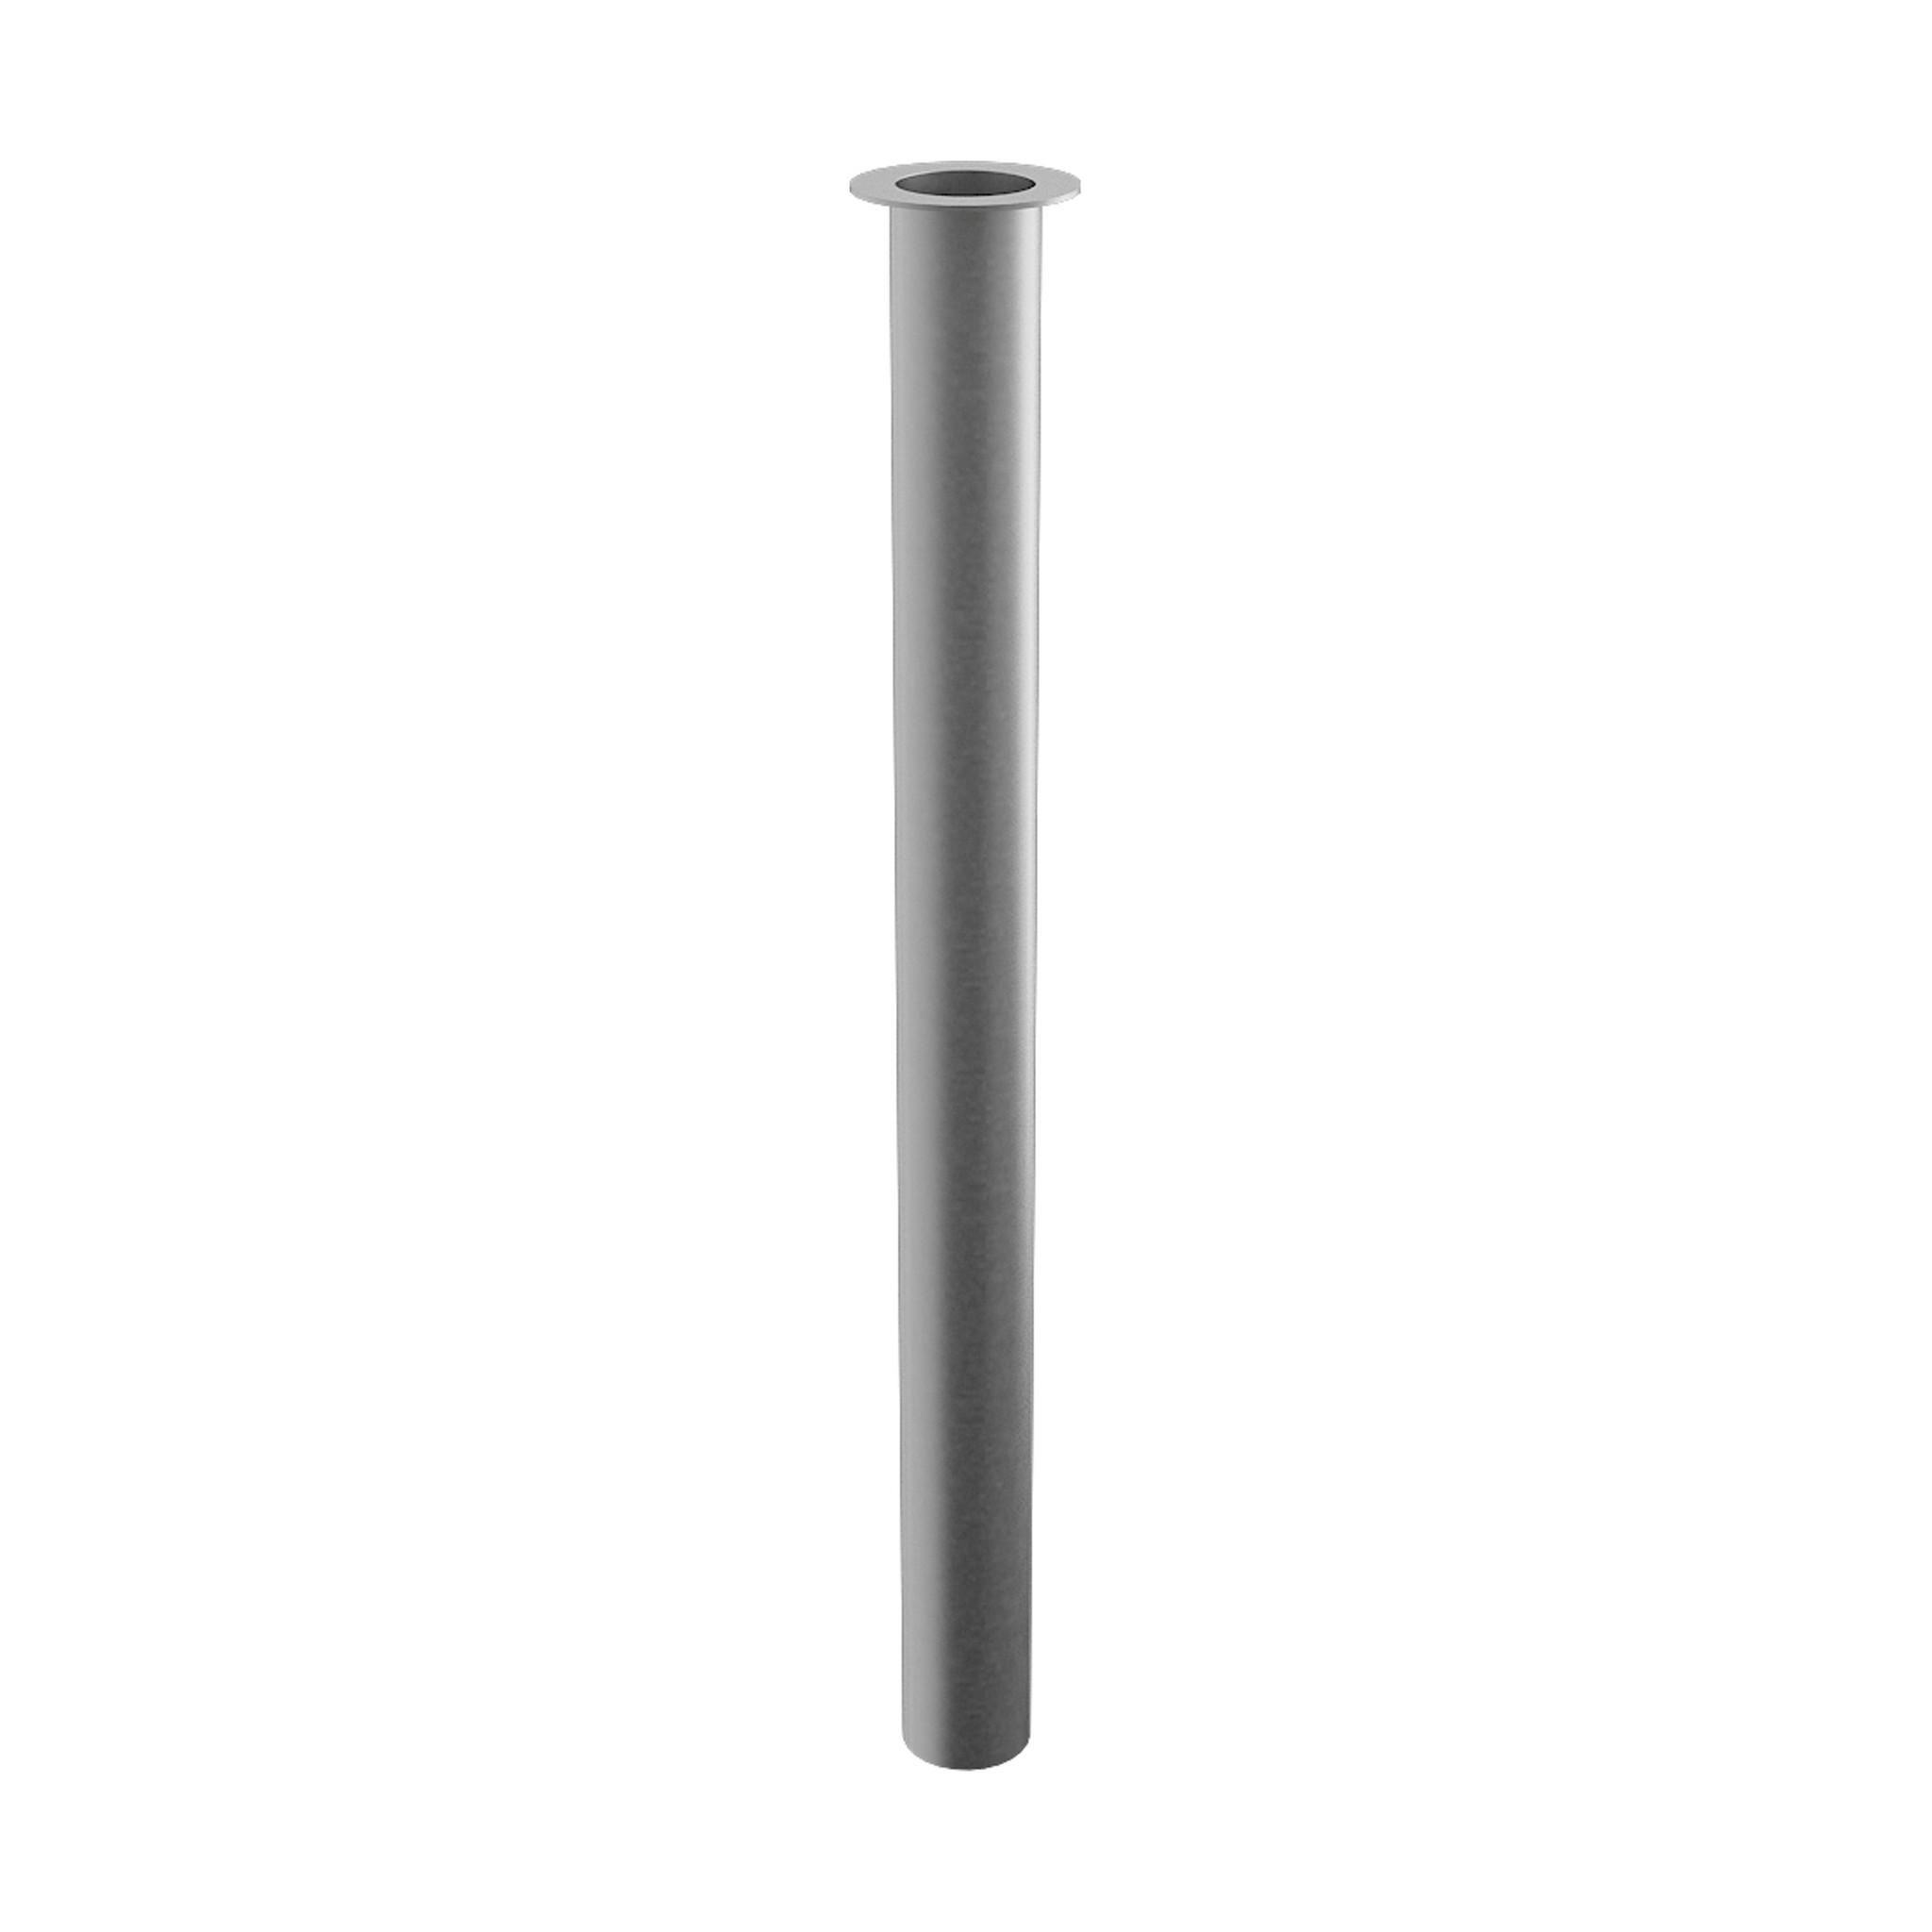 Minisuk tube avec collier 300 mm, ø25 mm pour siphon Minisuk